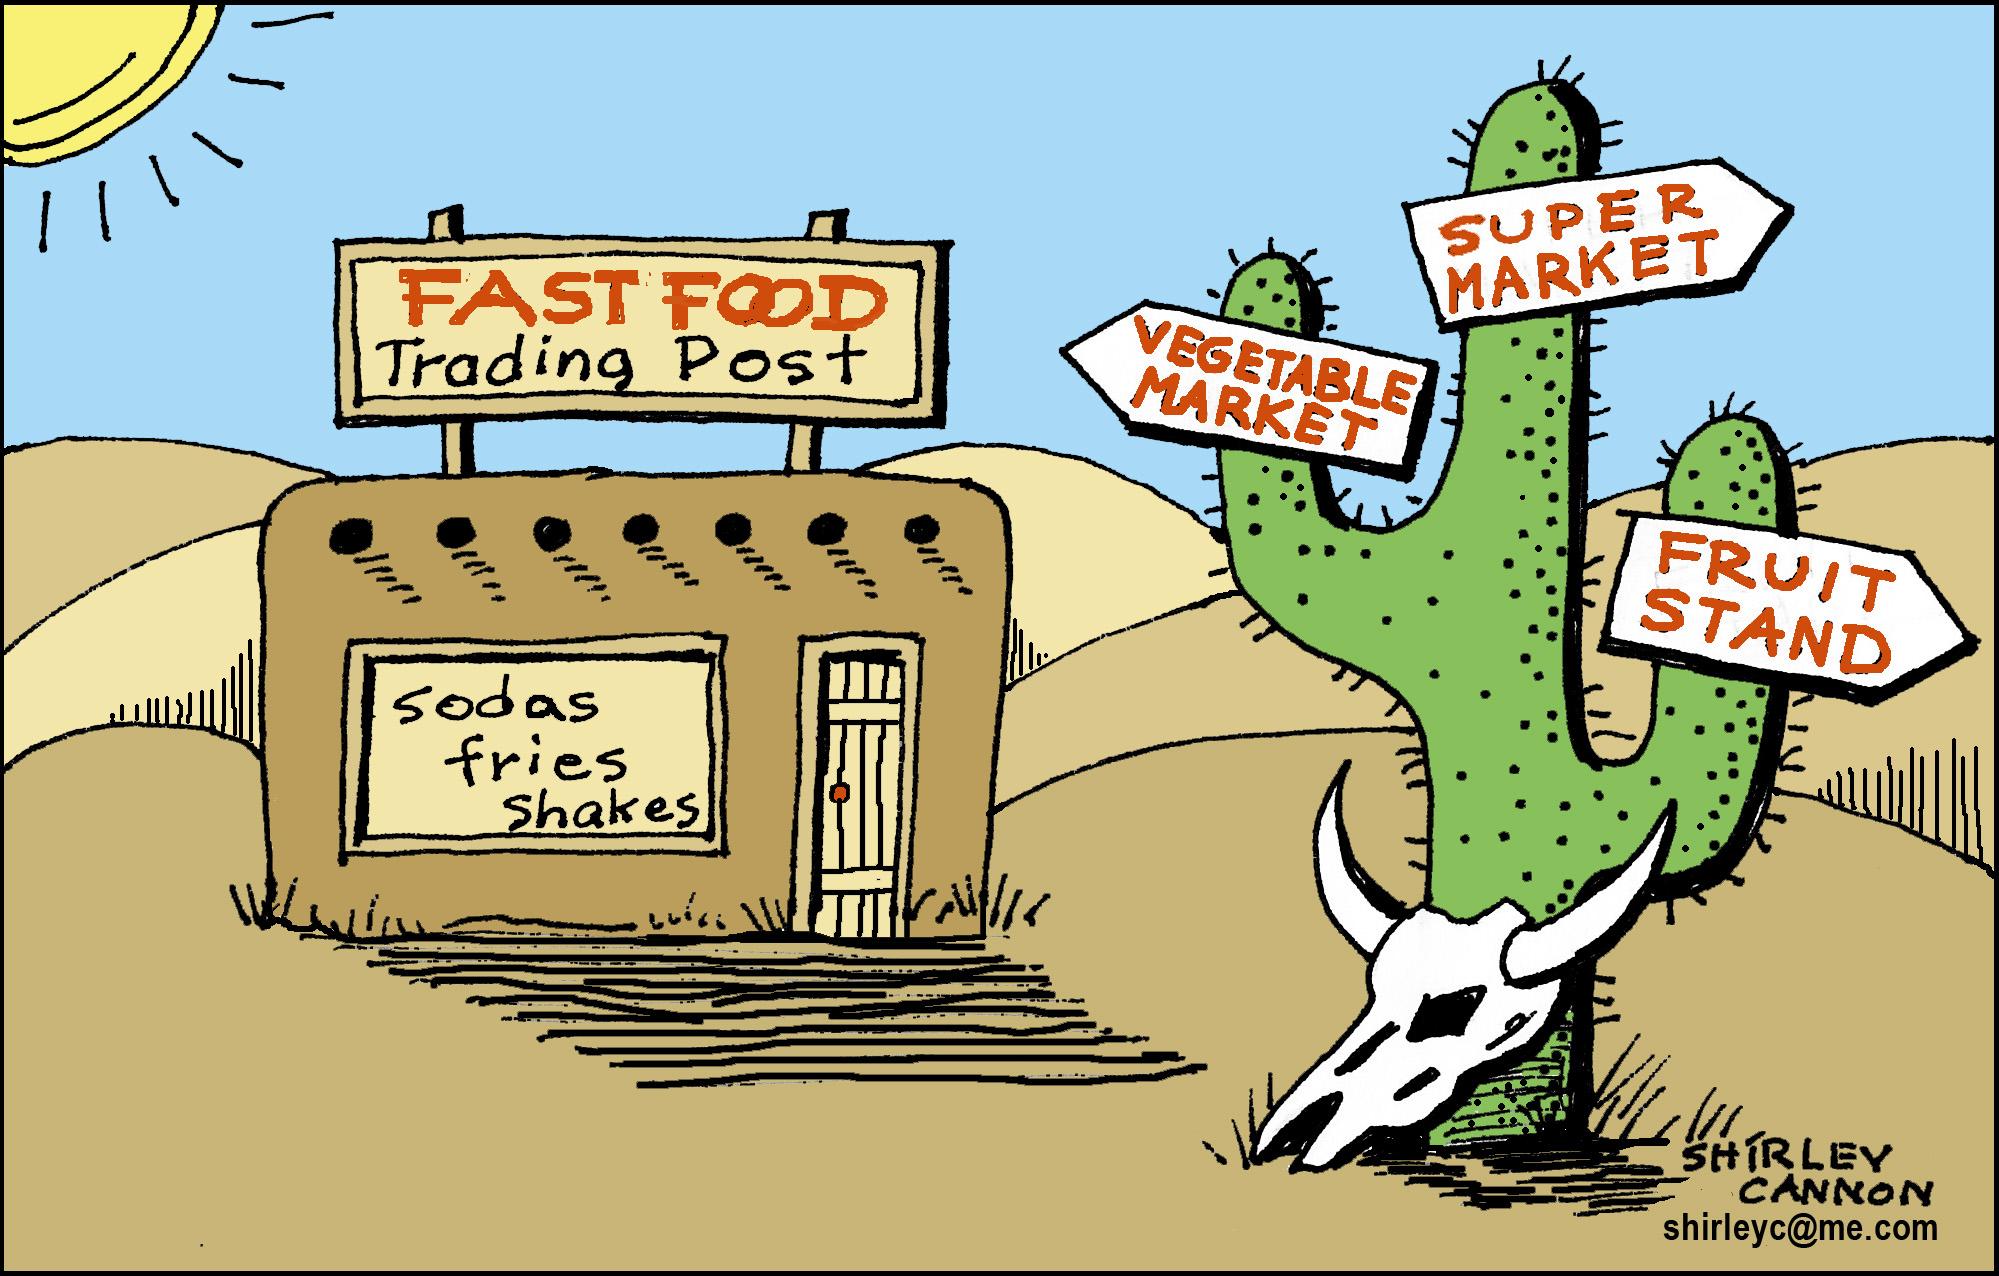 You have entered a food desert.